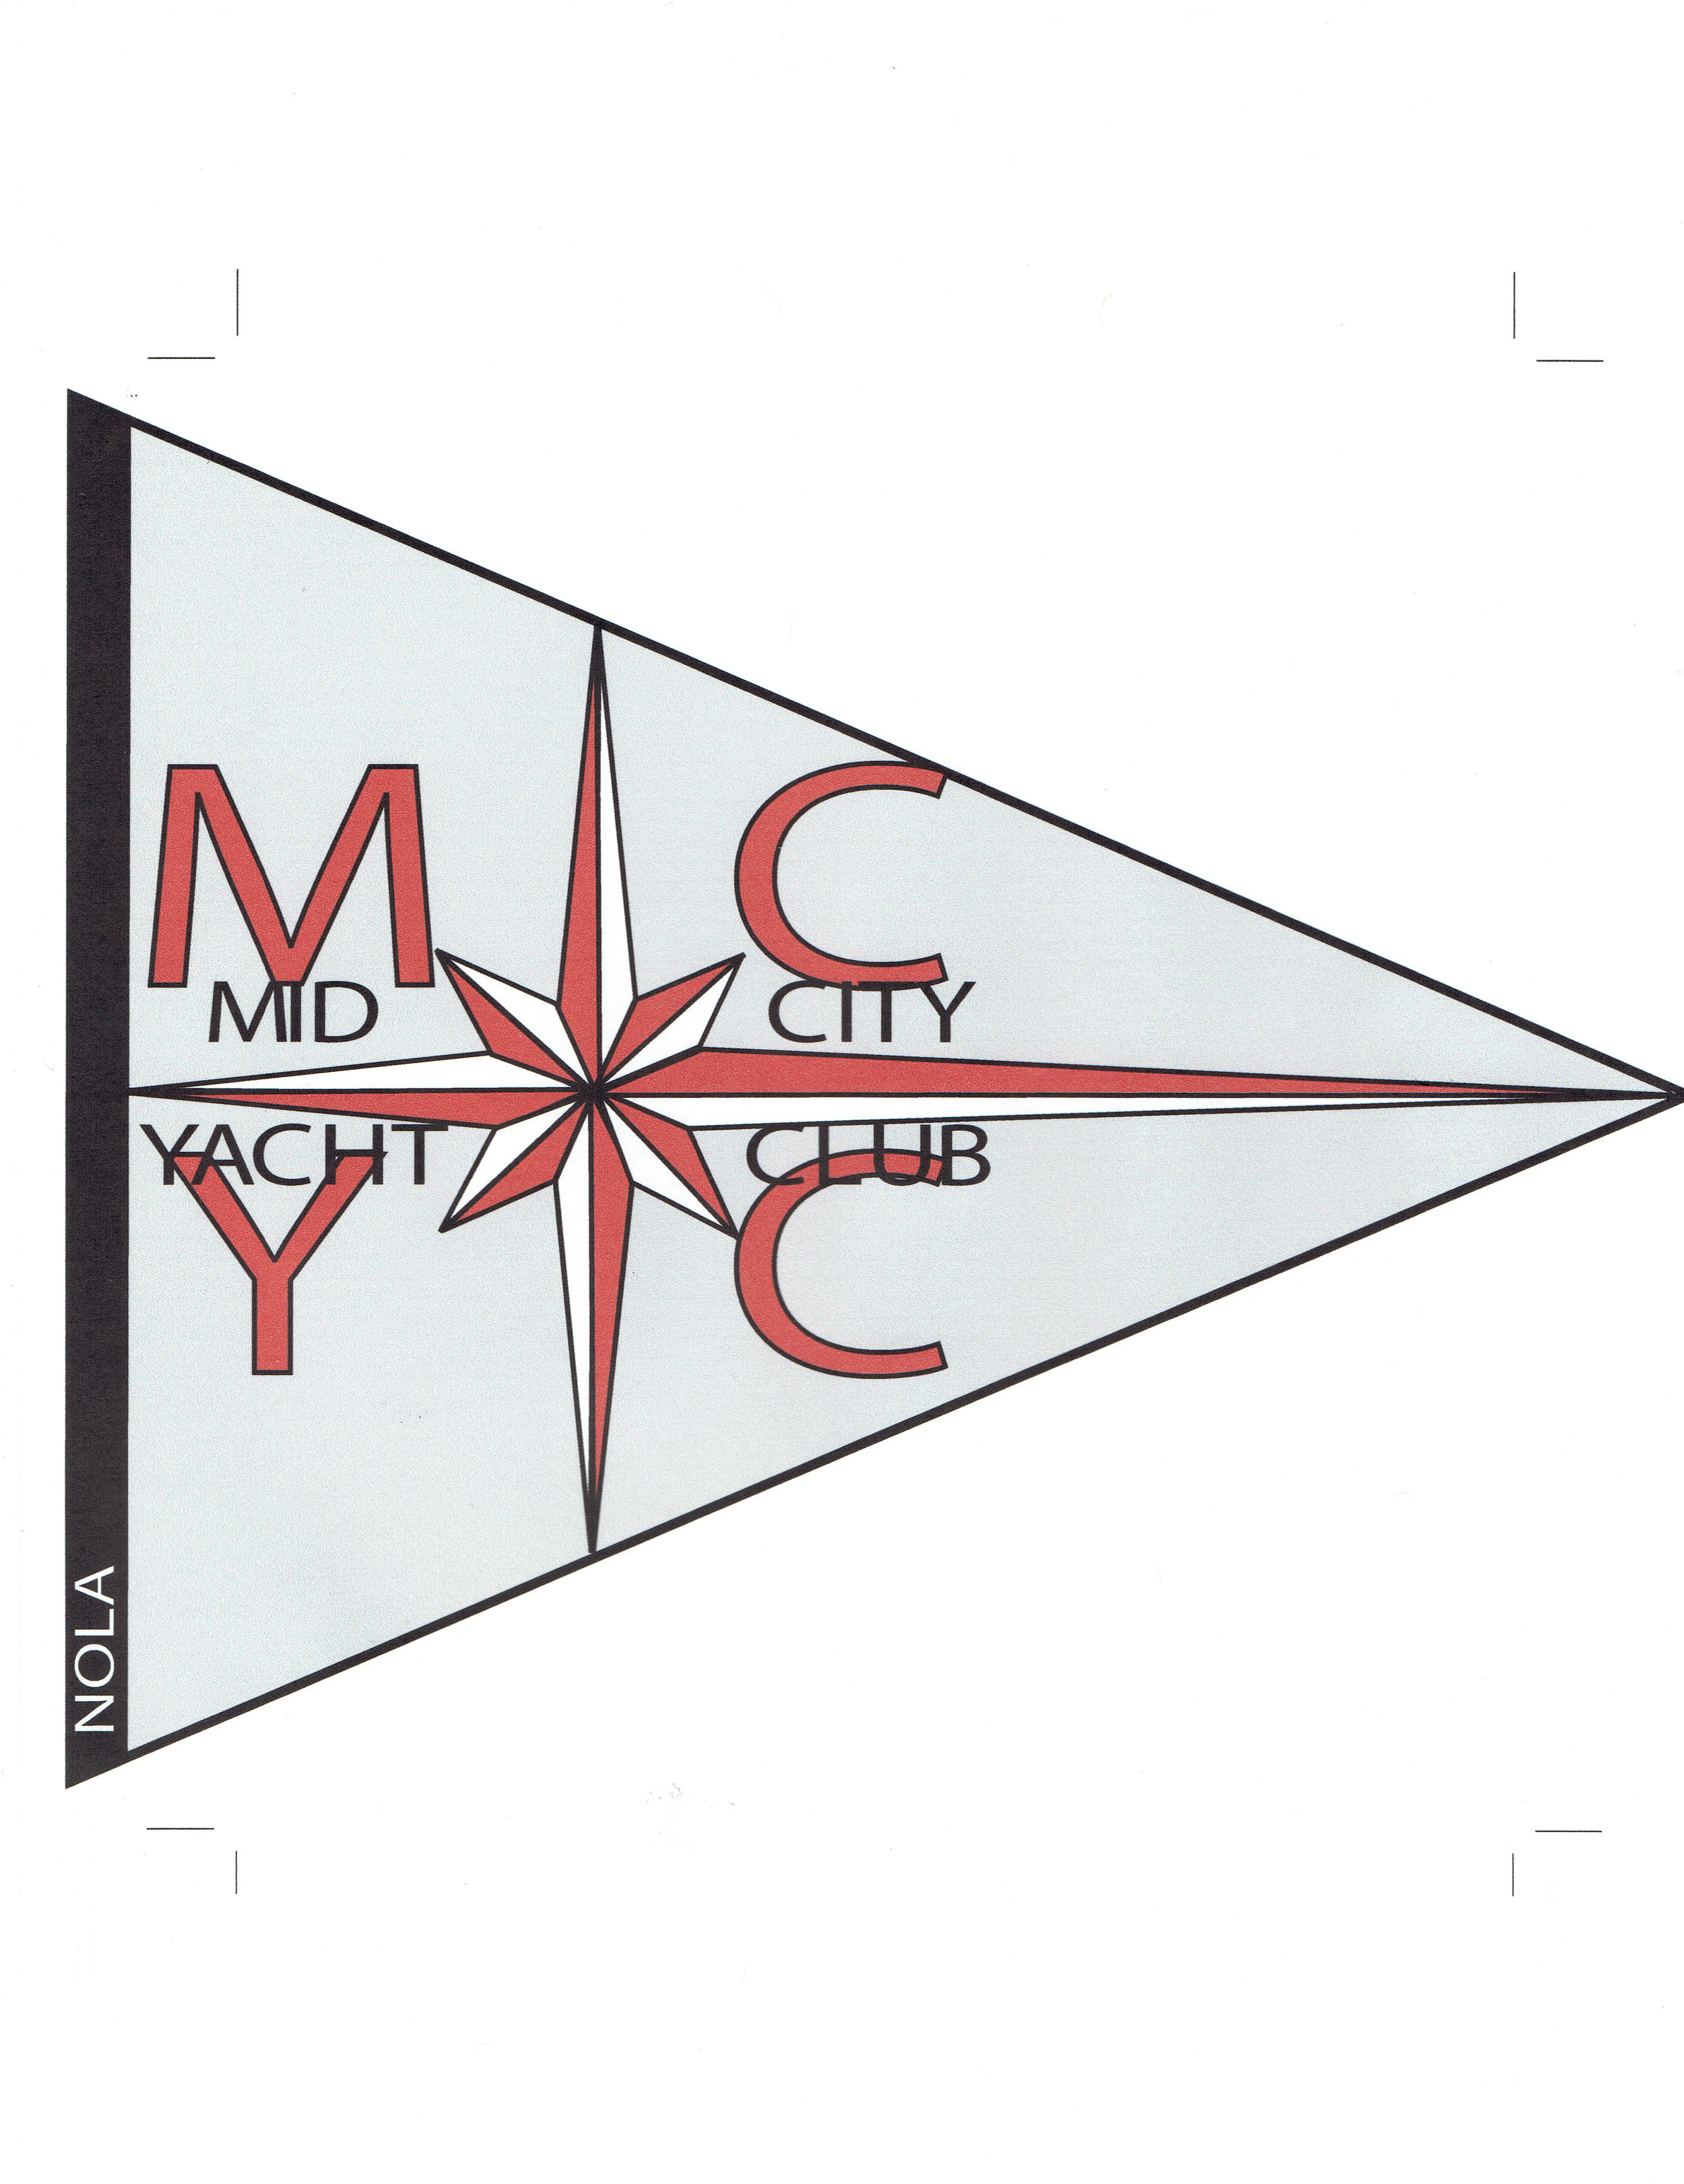 mcyc pennant grey bkg04132015.jpg